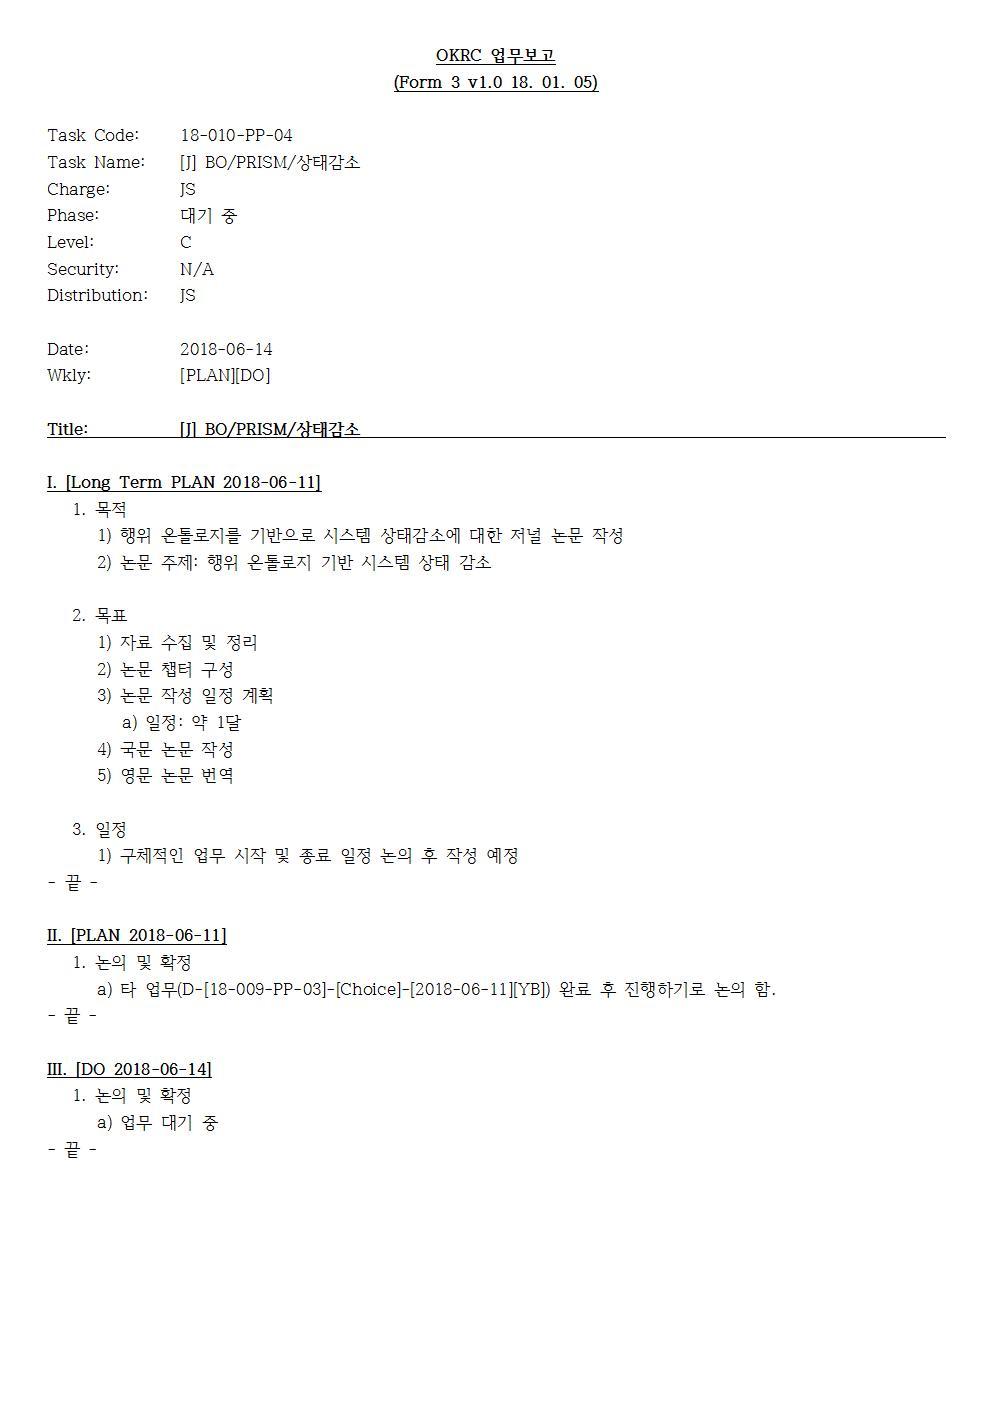 D-[18-010-PP-04]-[J-BO-PRISM-State-minimization]-[2018-06-14][JS]001.jpg